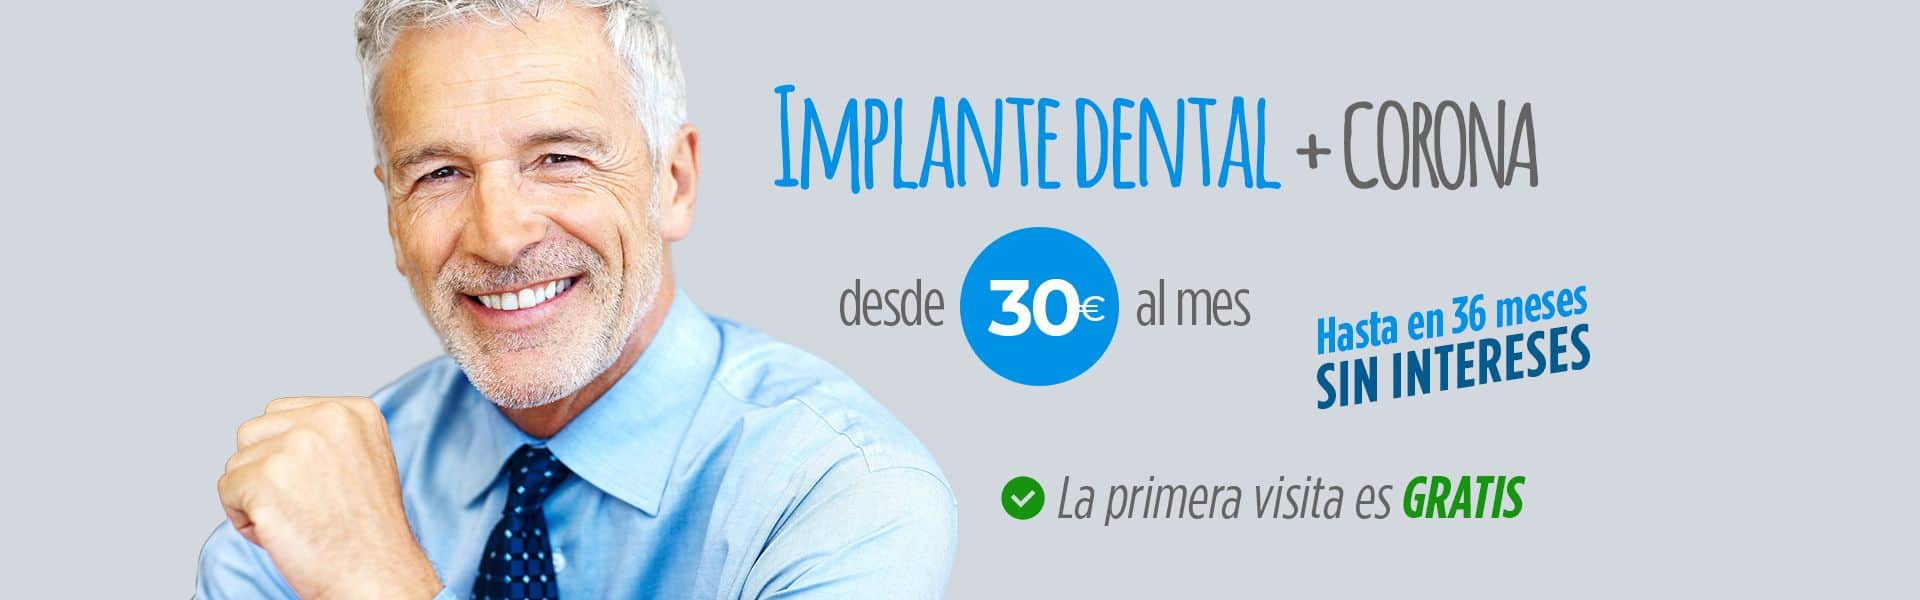 implante mas corona chandler